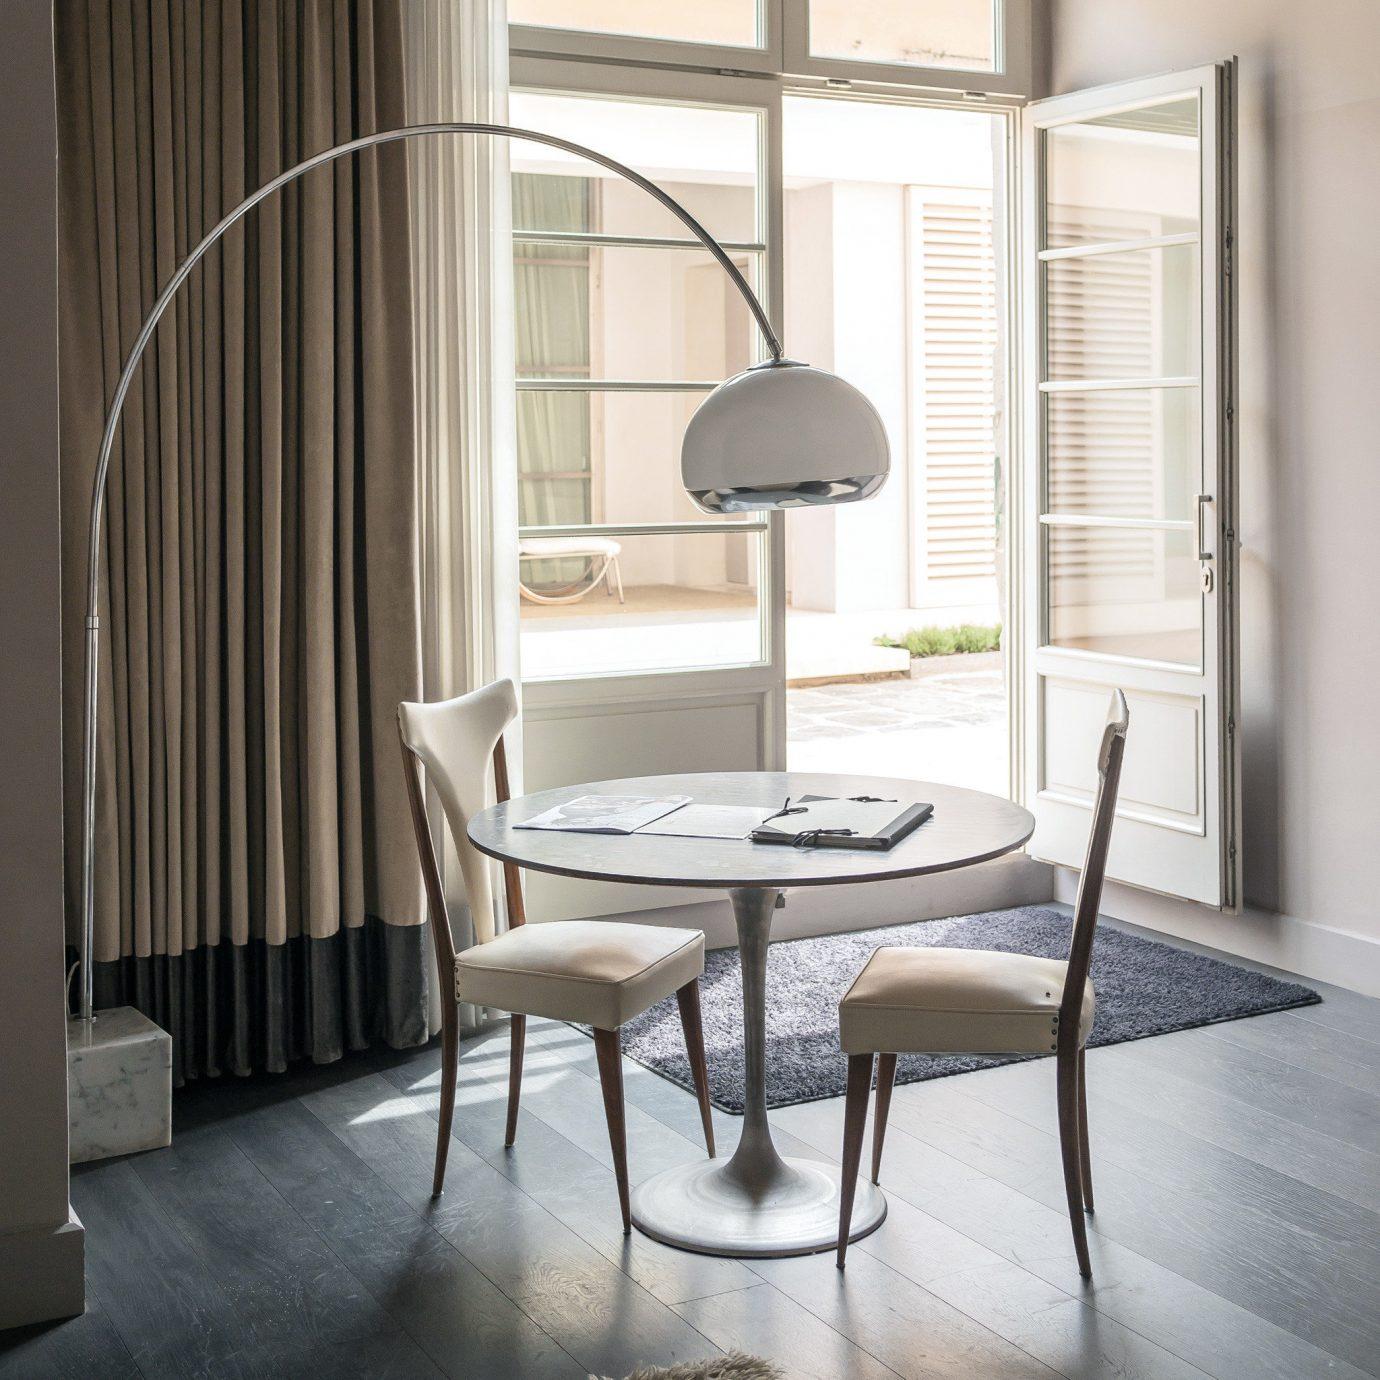 City Lounge Modern Patio chair living room Bedroom